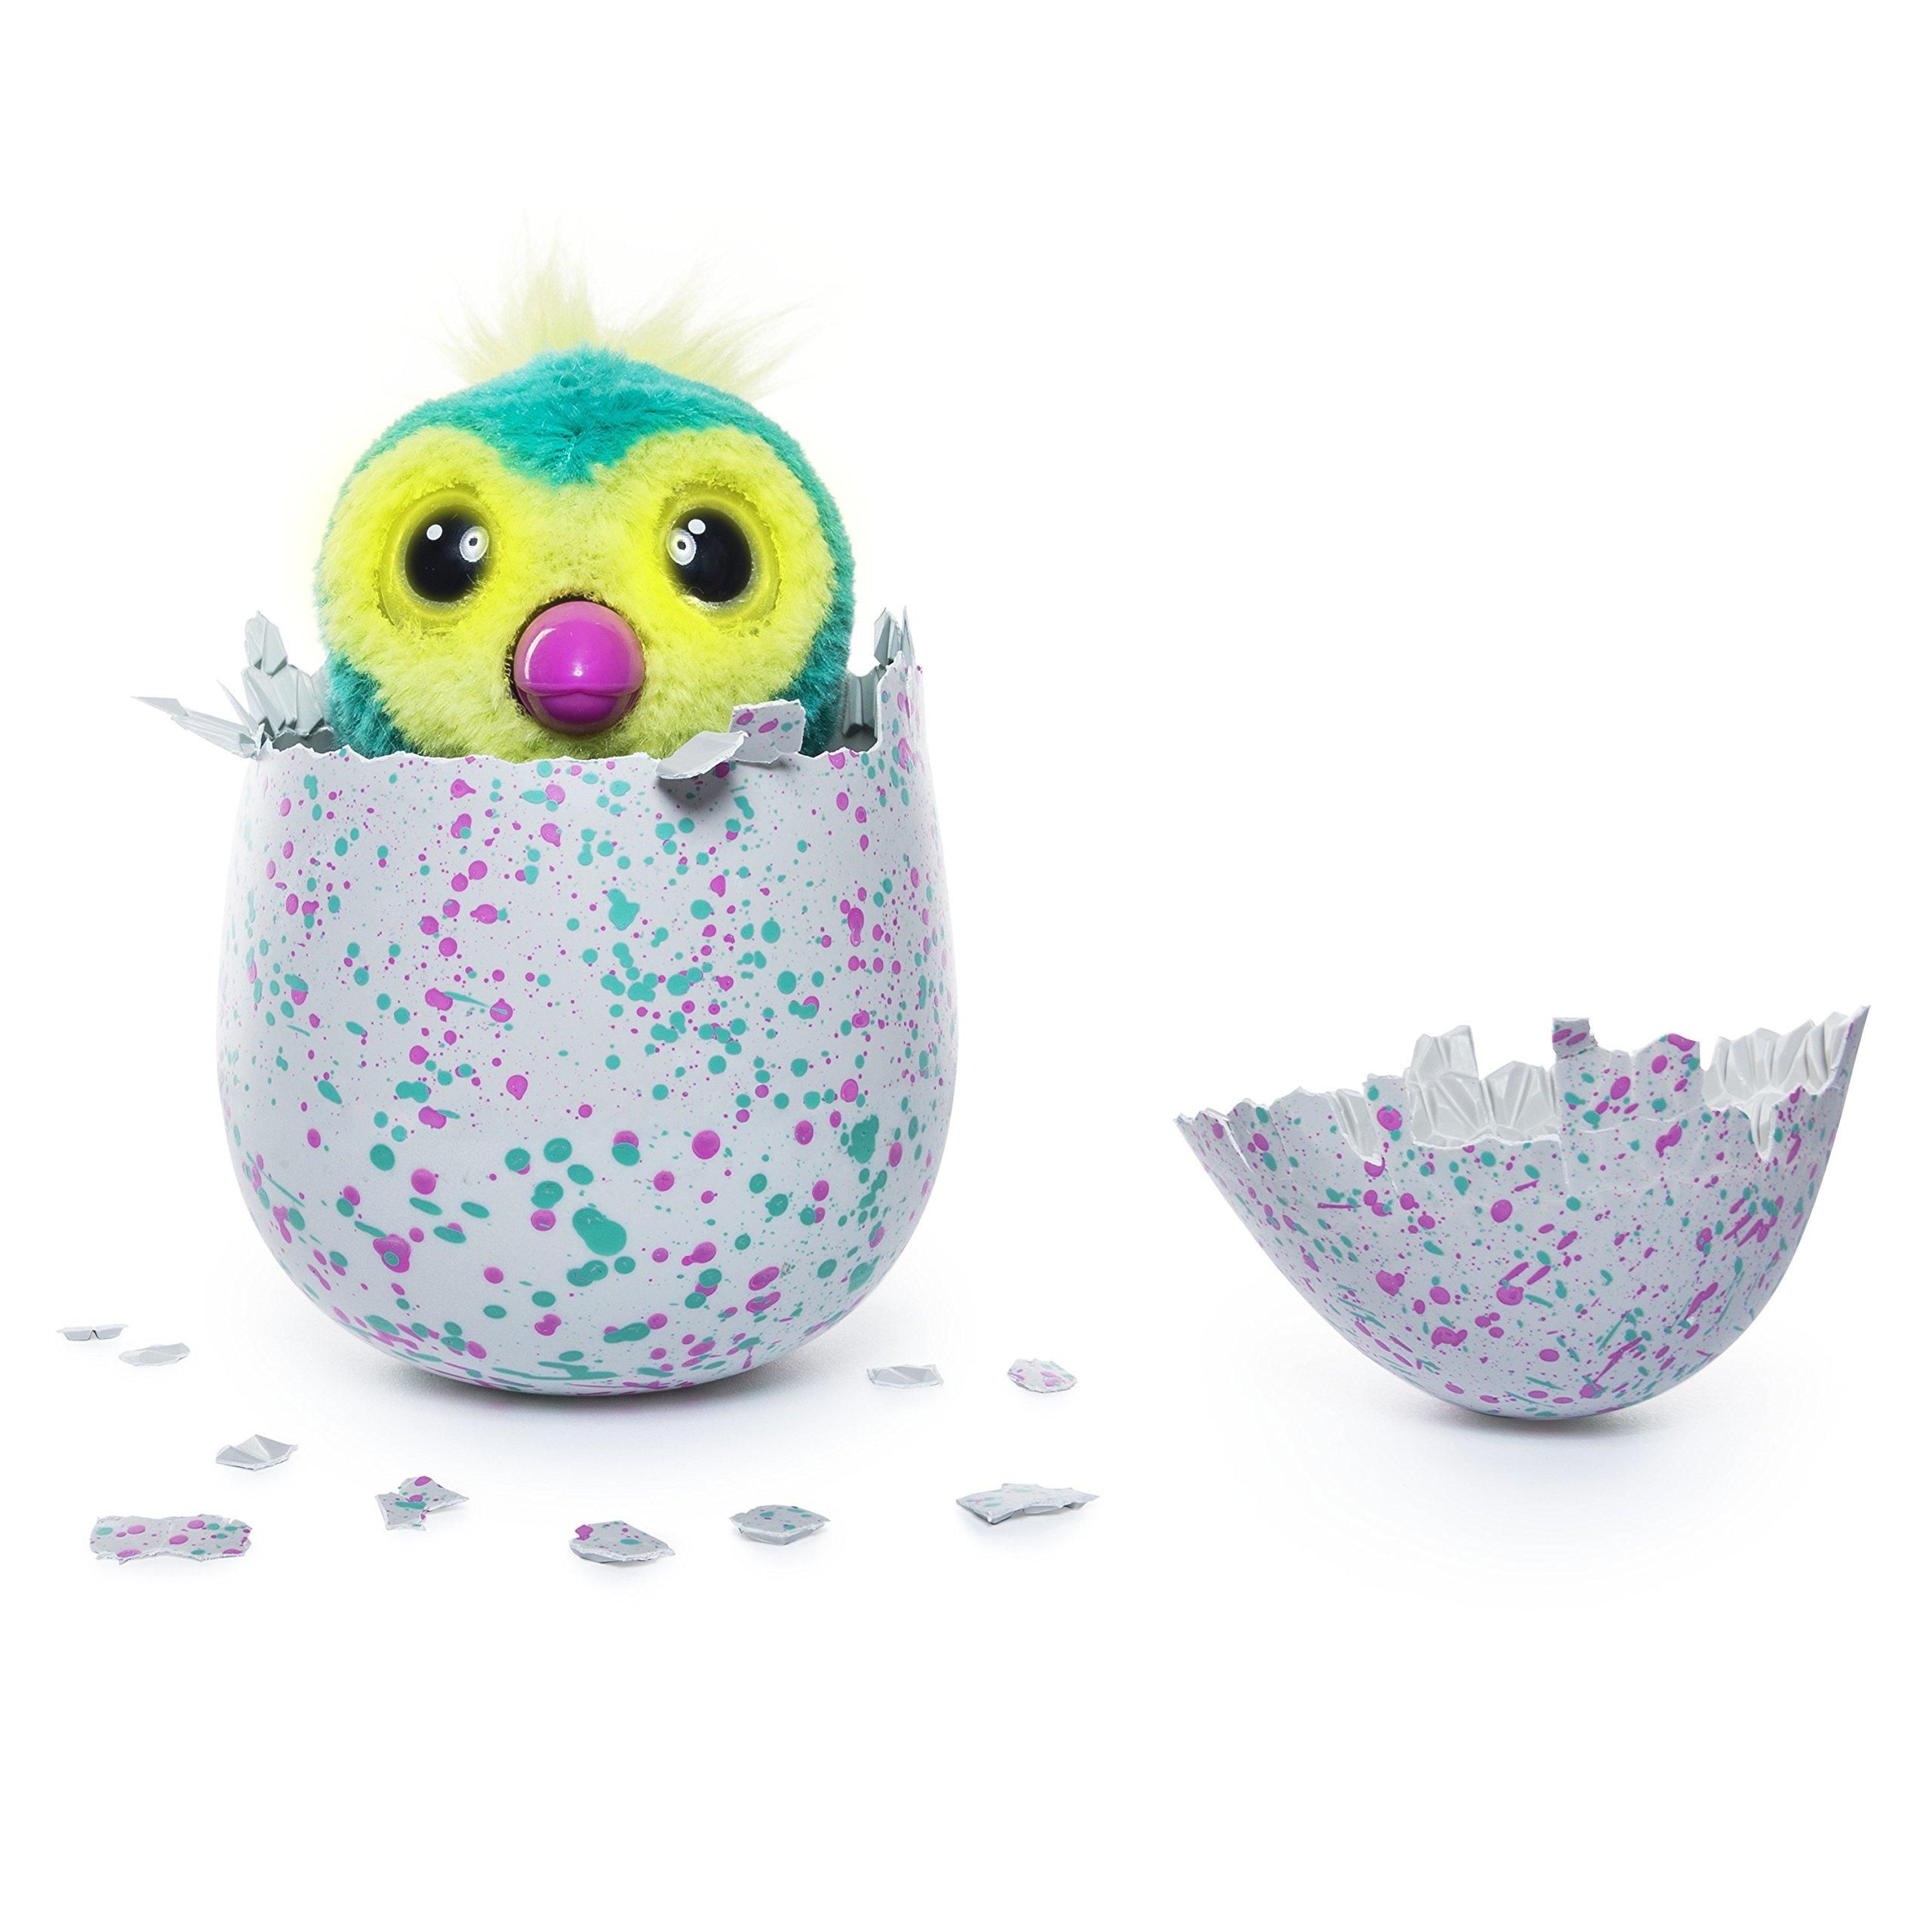 Hatchimals Penguala - Teal/Pink by Hatchimals (Image #5)